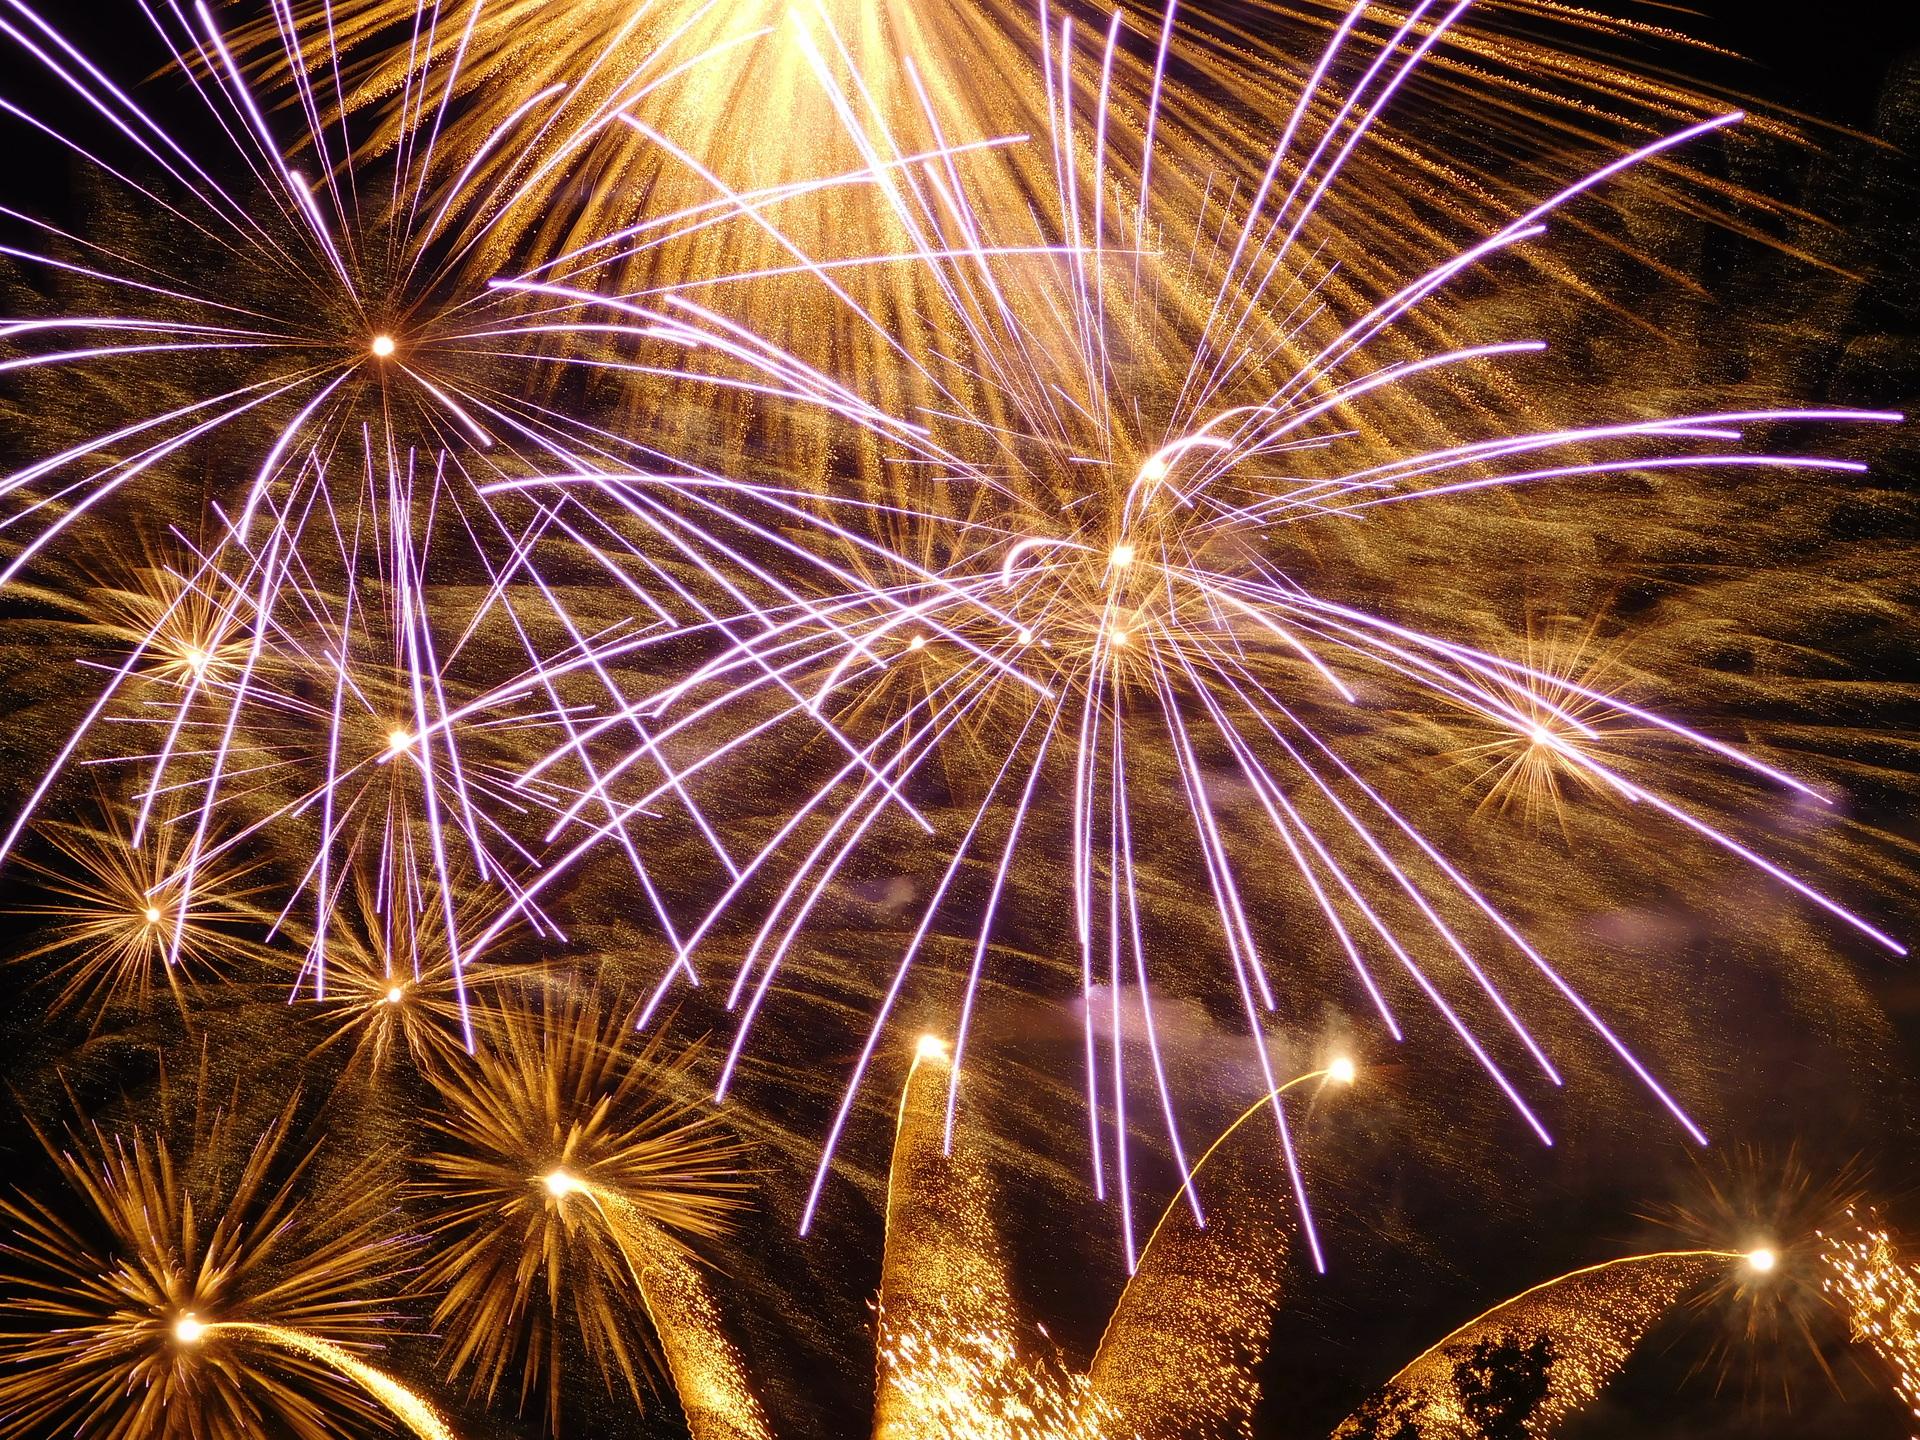 Fireworks | rick.cognyl.fournier, bright, celebration, explosion